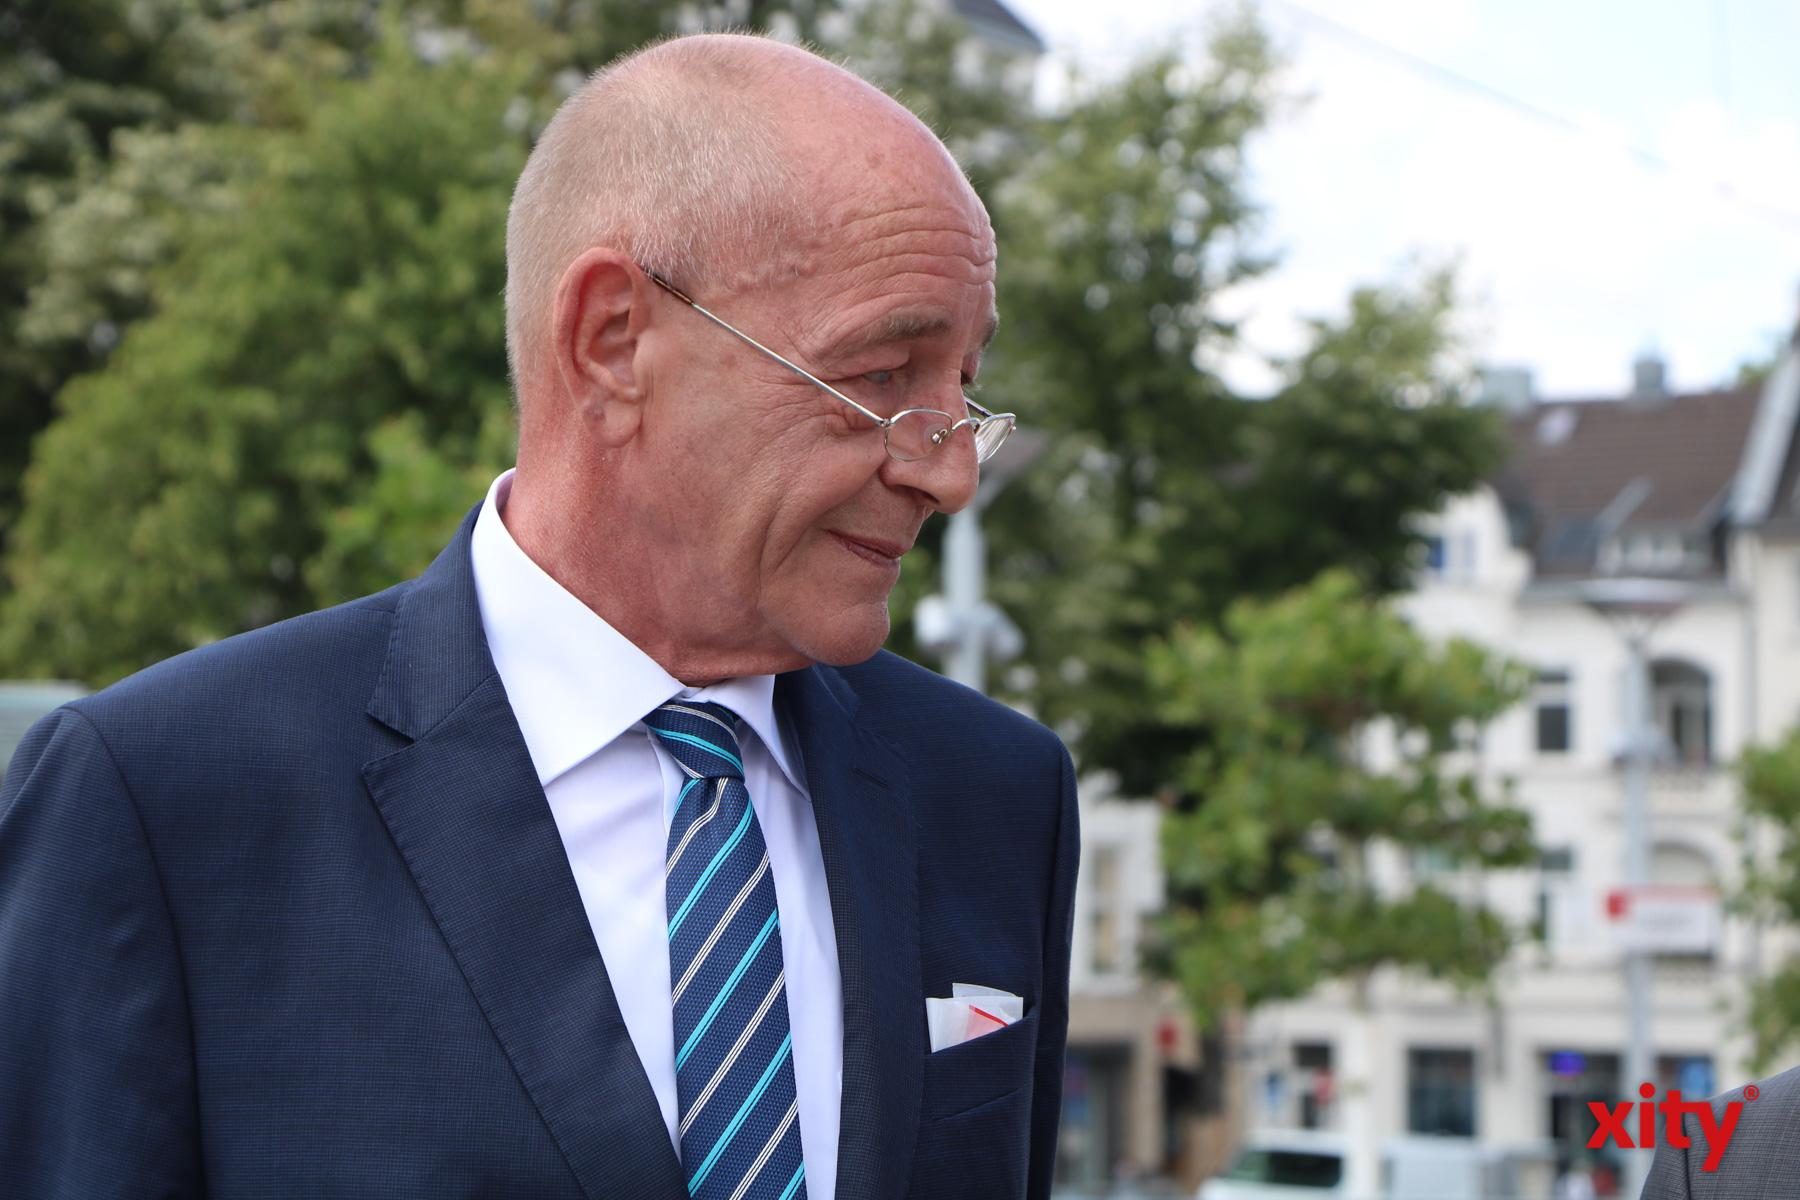 Bezirksbürgermeister Rolf Tups (Foto: xity)